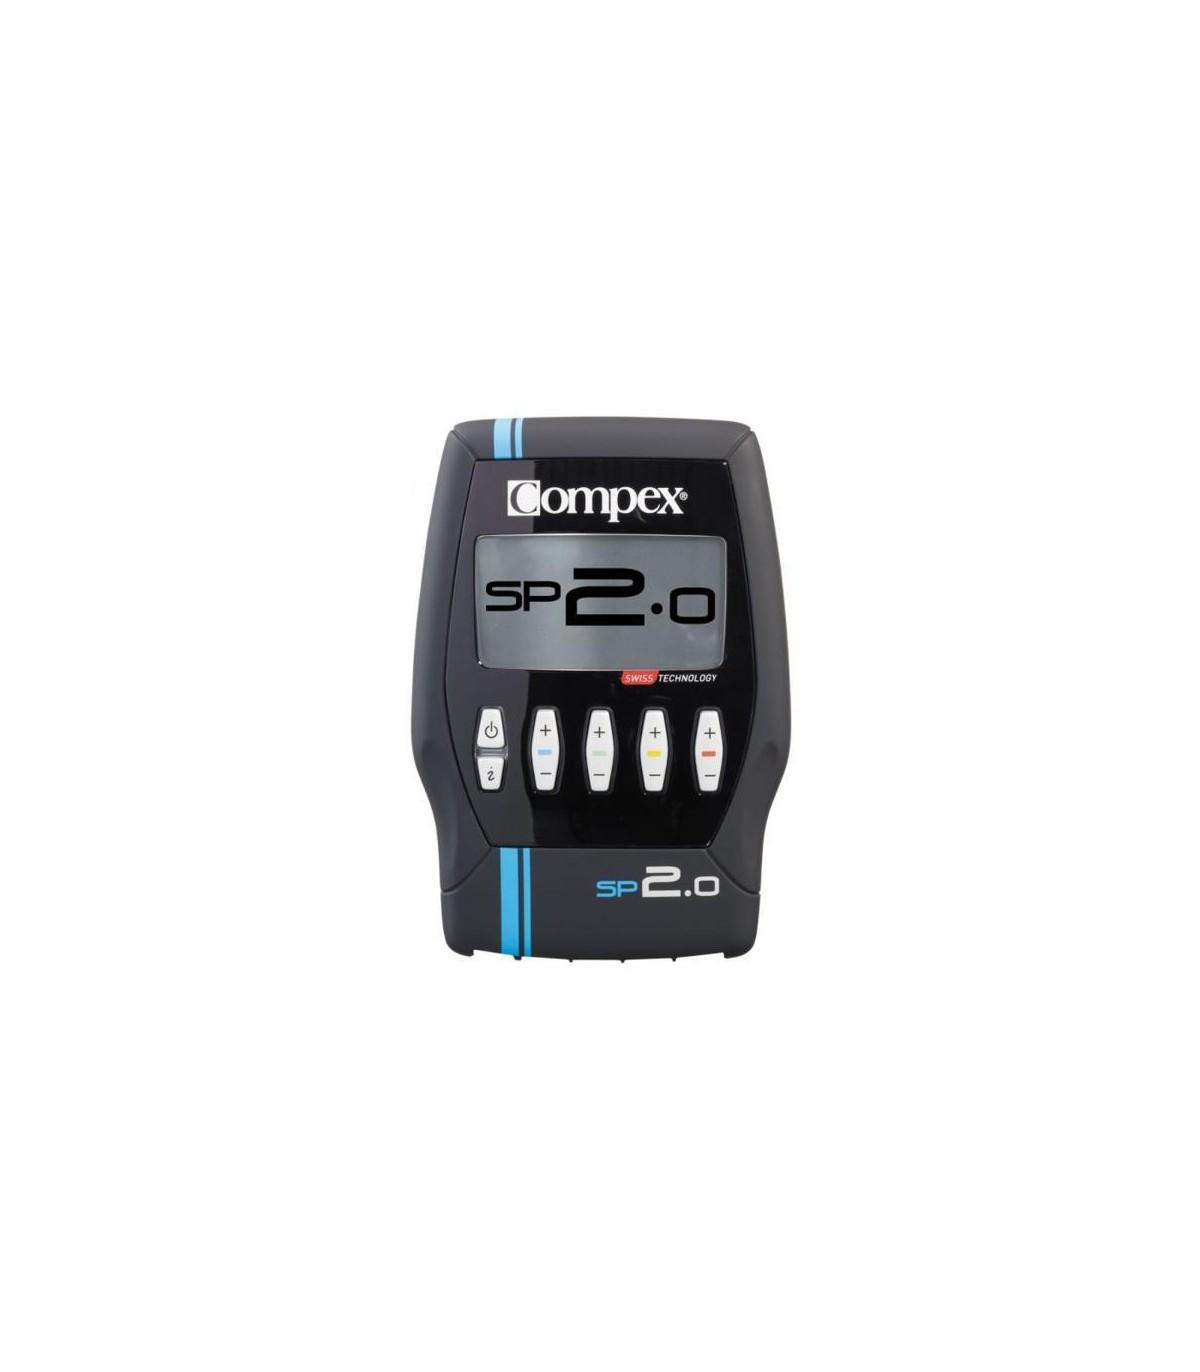 Compex SP 2.0 · Producto Compex · Electroestimuladores · Kukimbia Shop - Tienda Online Deportiva